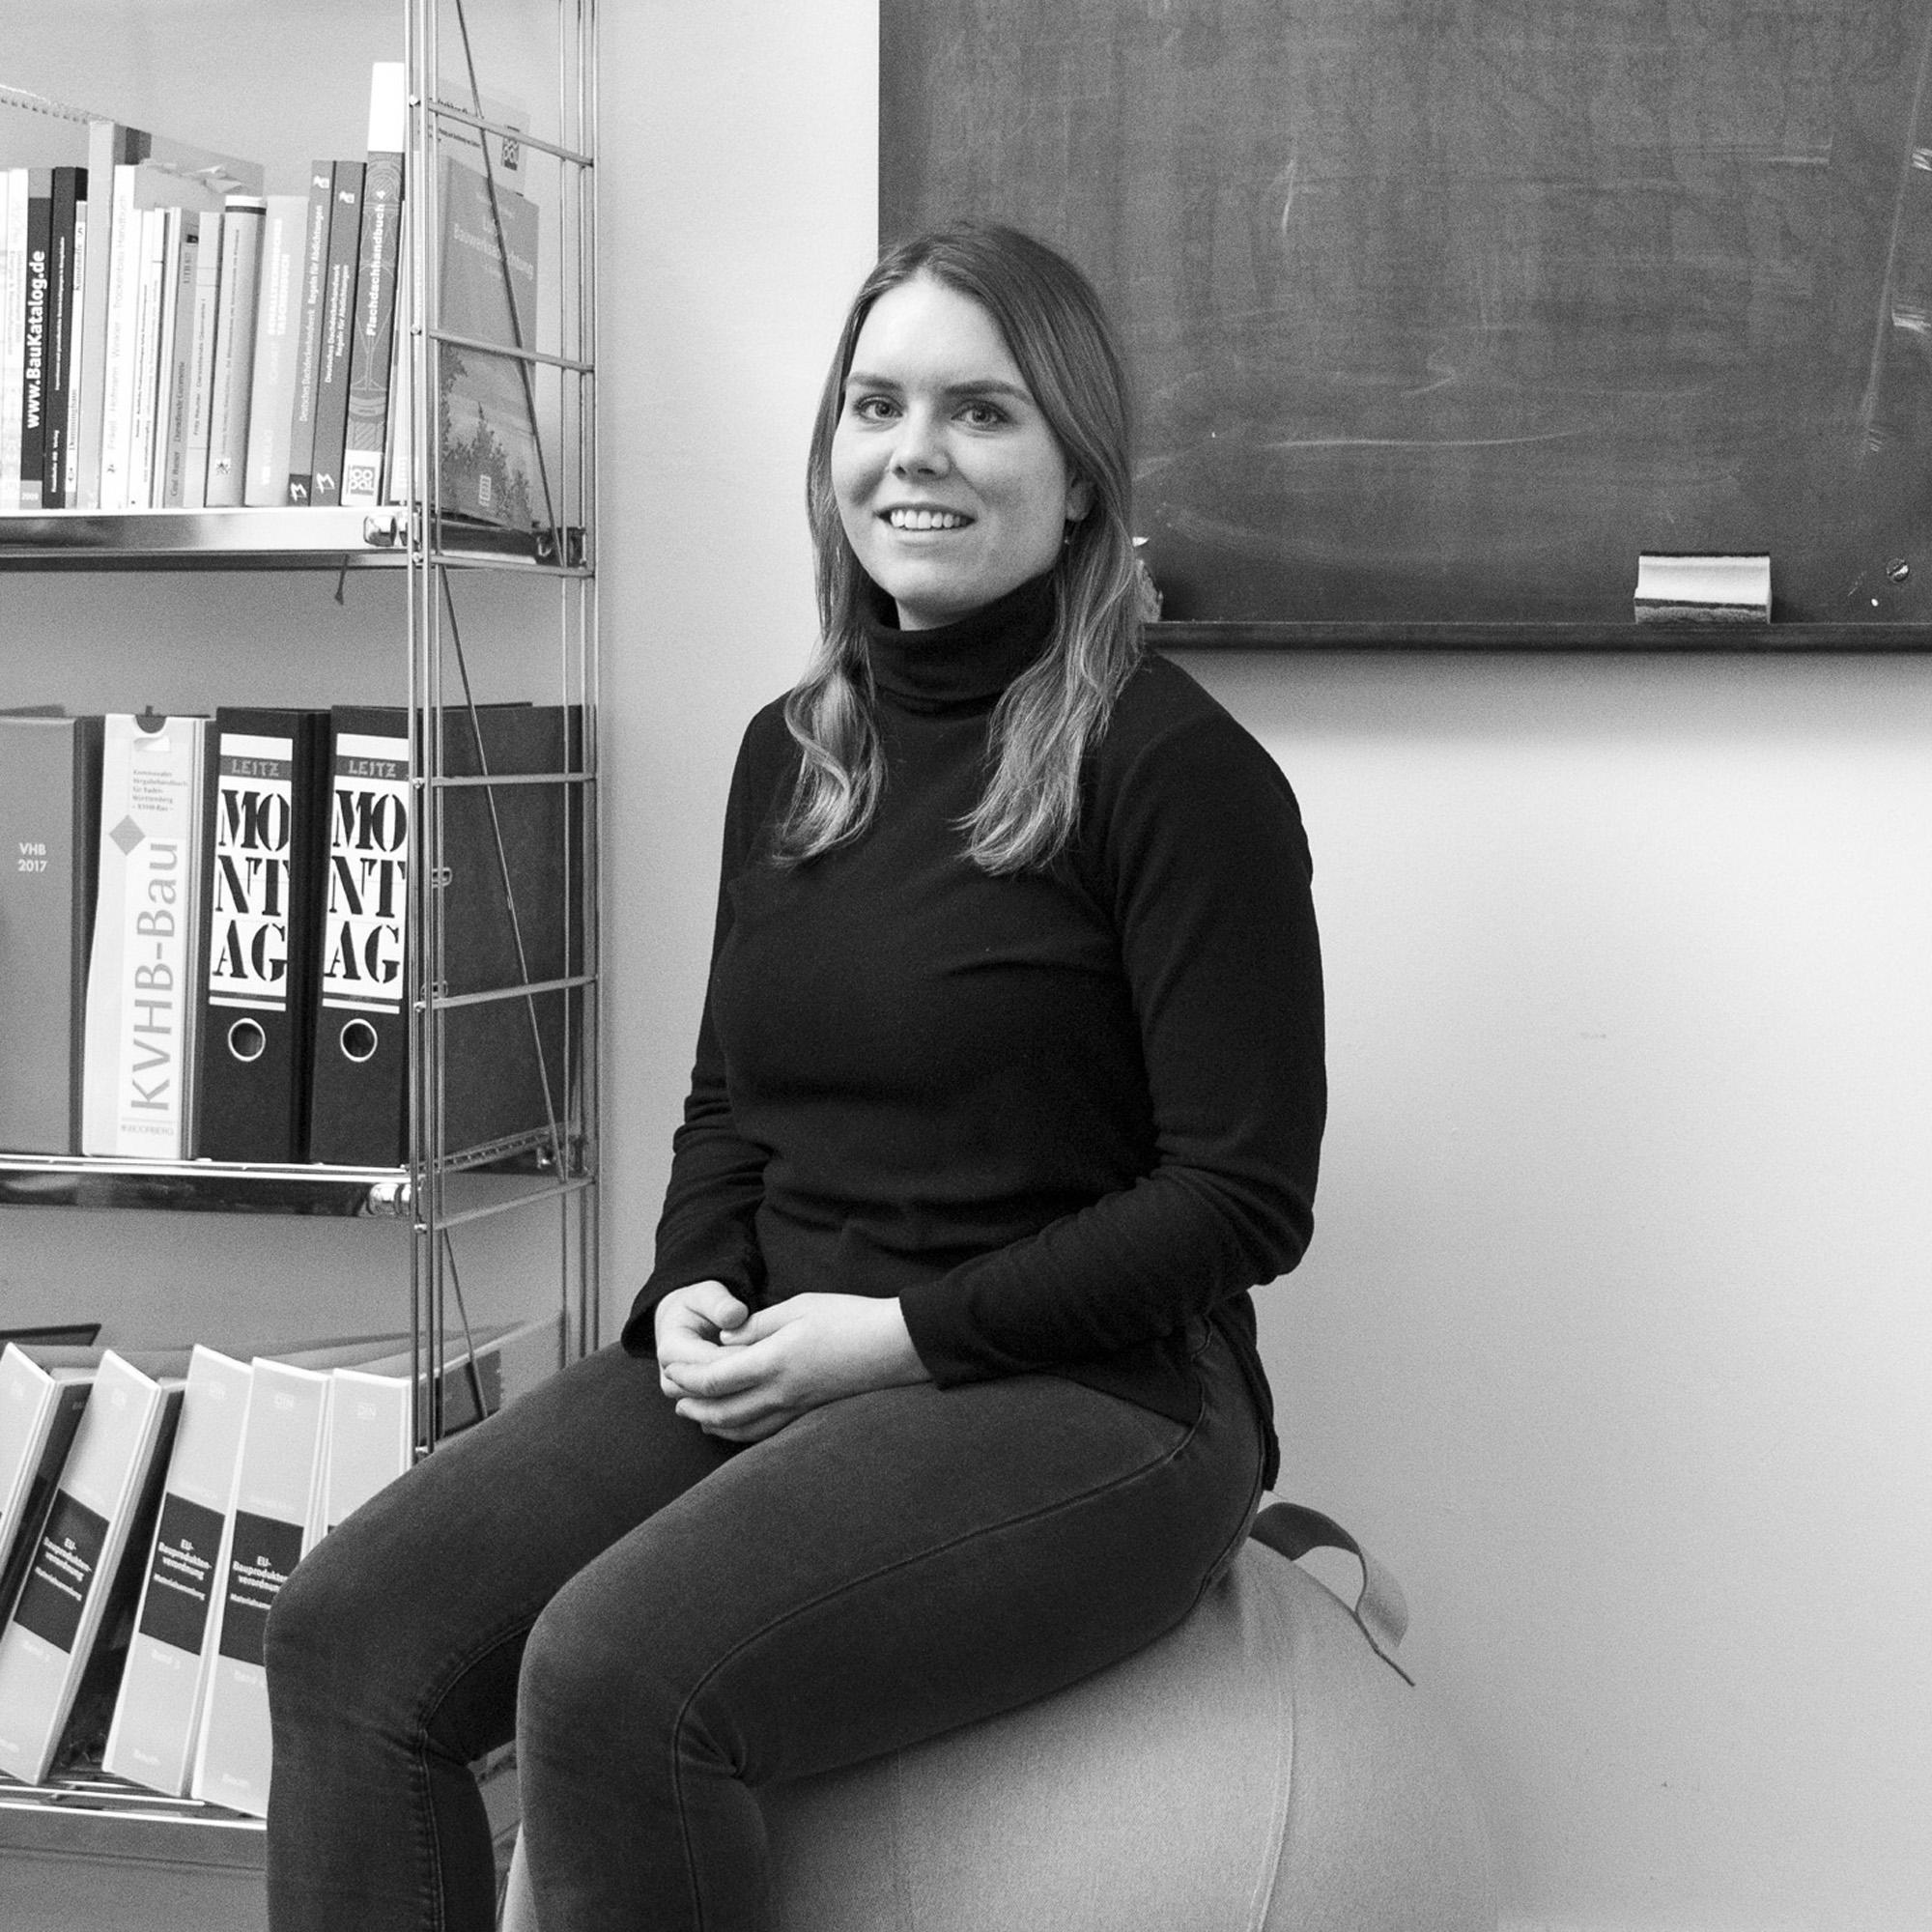 Susanne Kaum